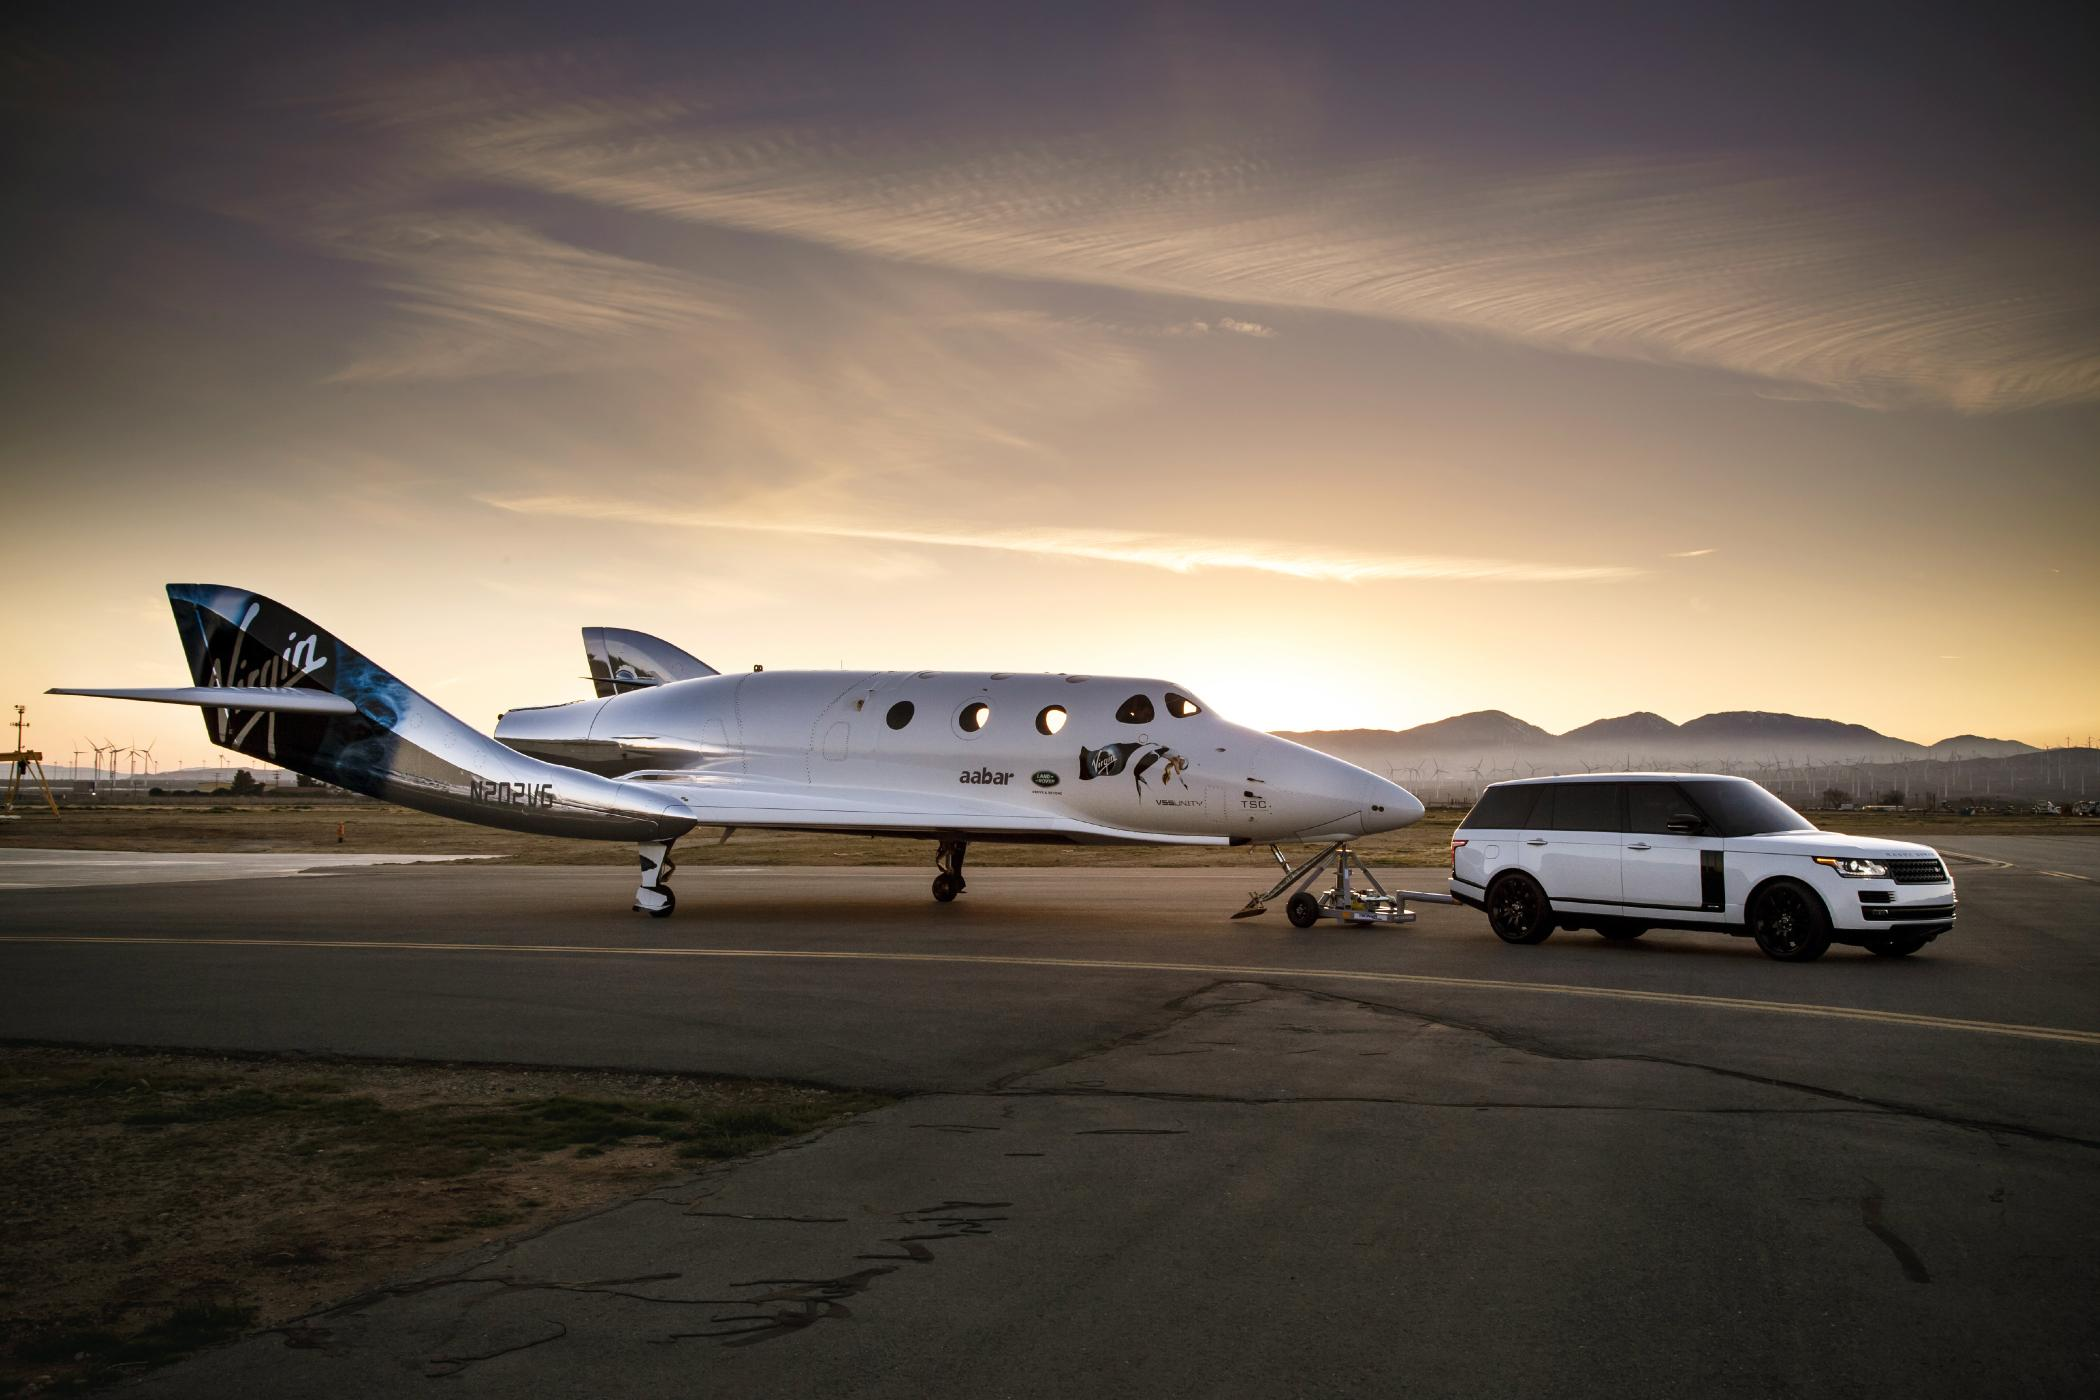 Virgin-Galactic-VSS-Unity-and-Range-Rover-26.jpg